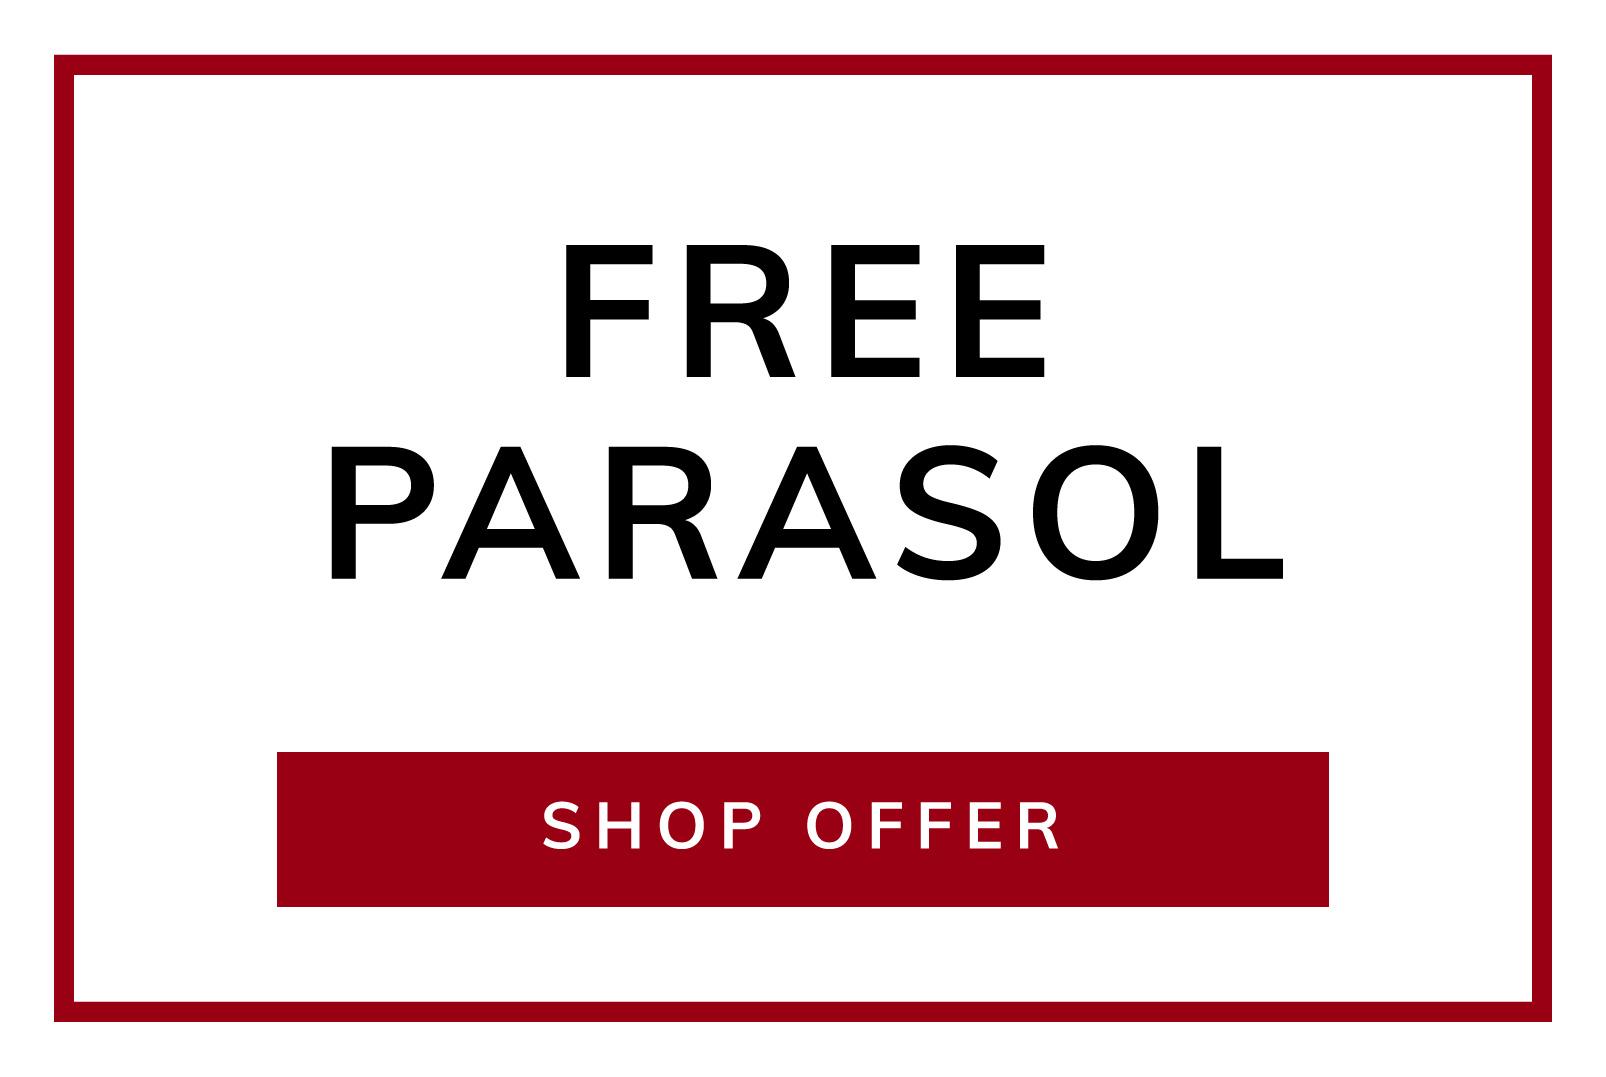 Free Parasol